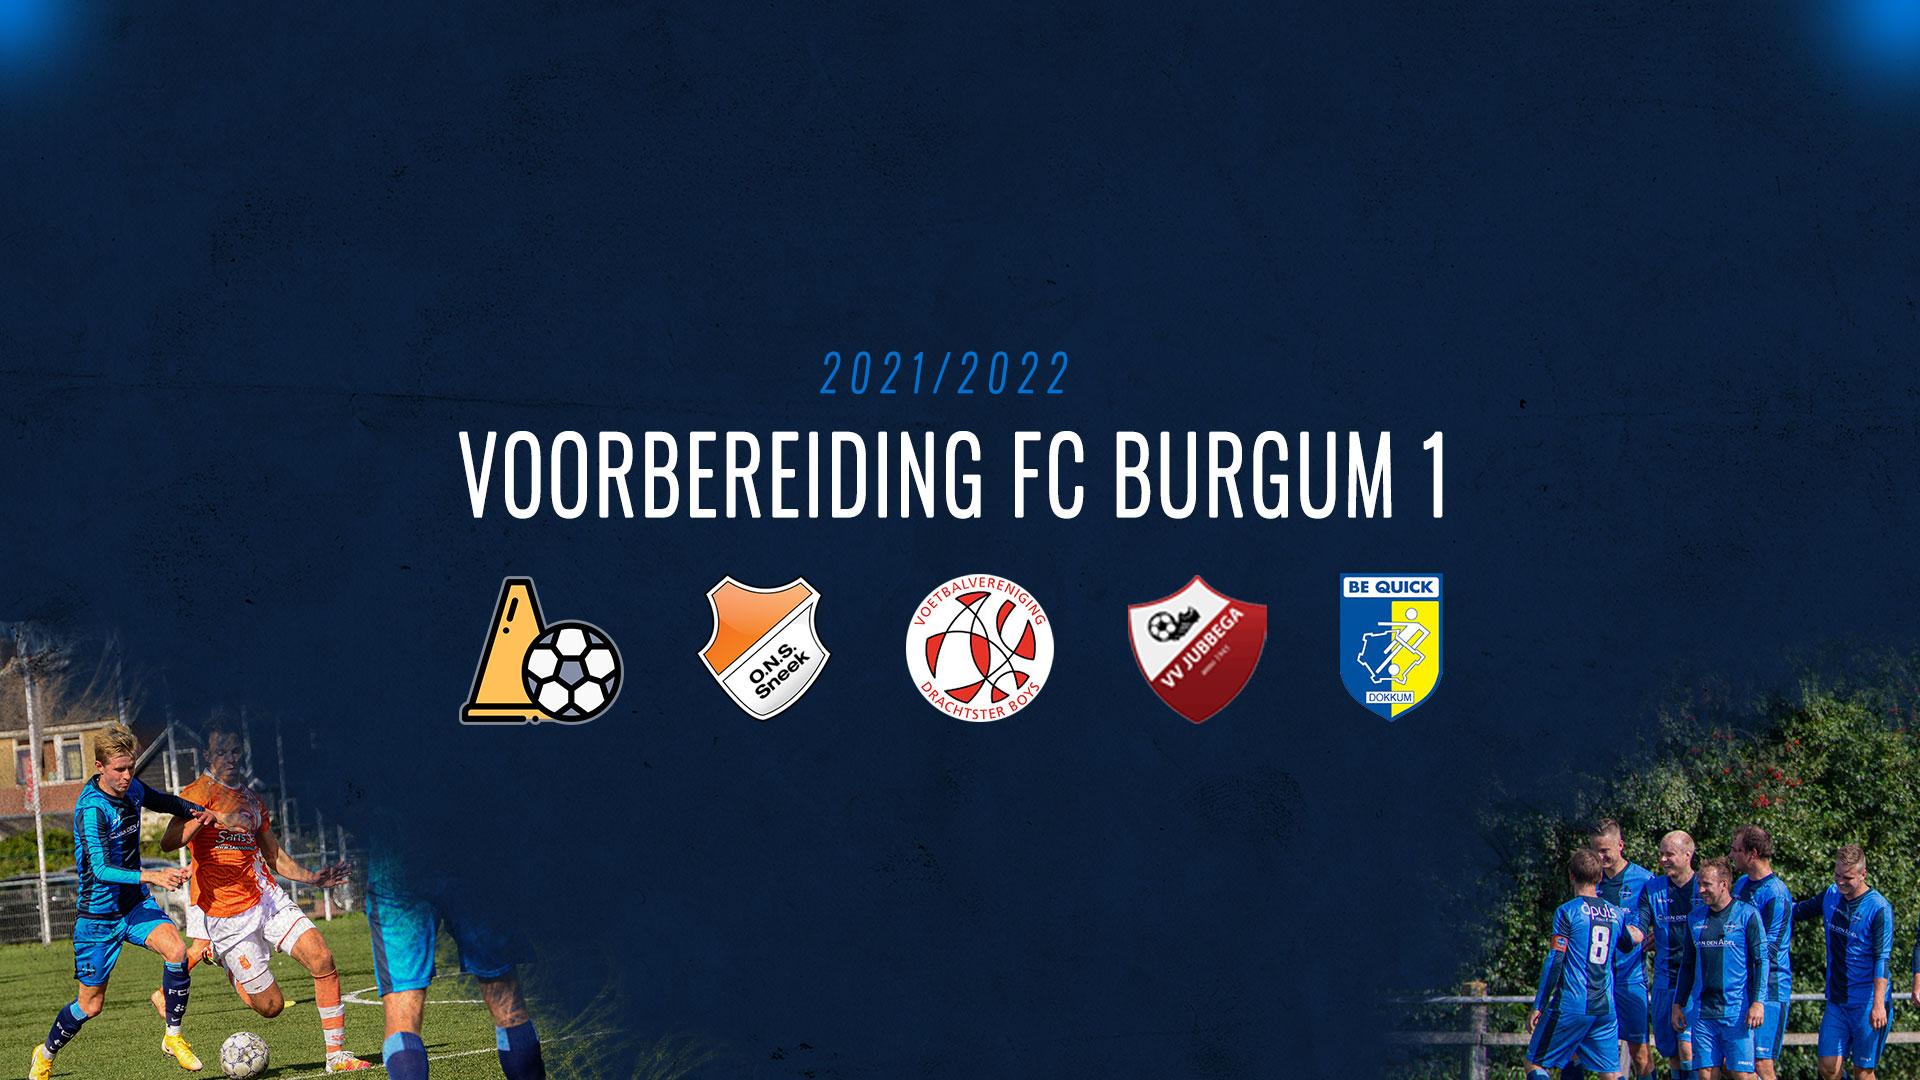 Voorbereiding FC Burgum 1